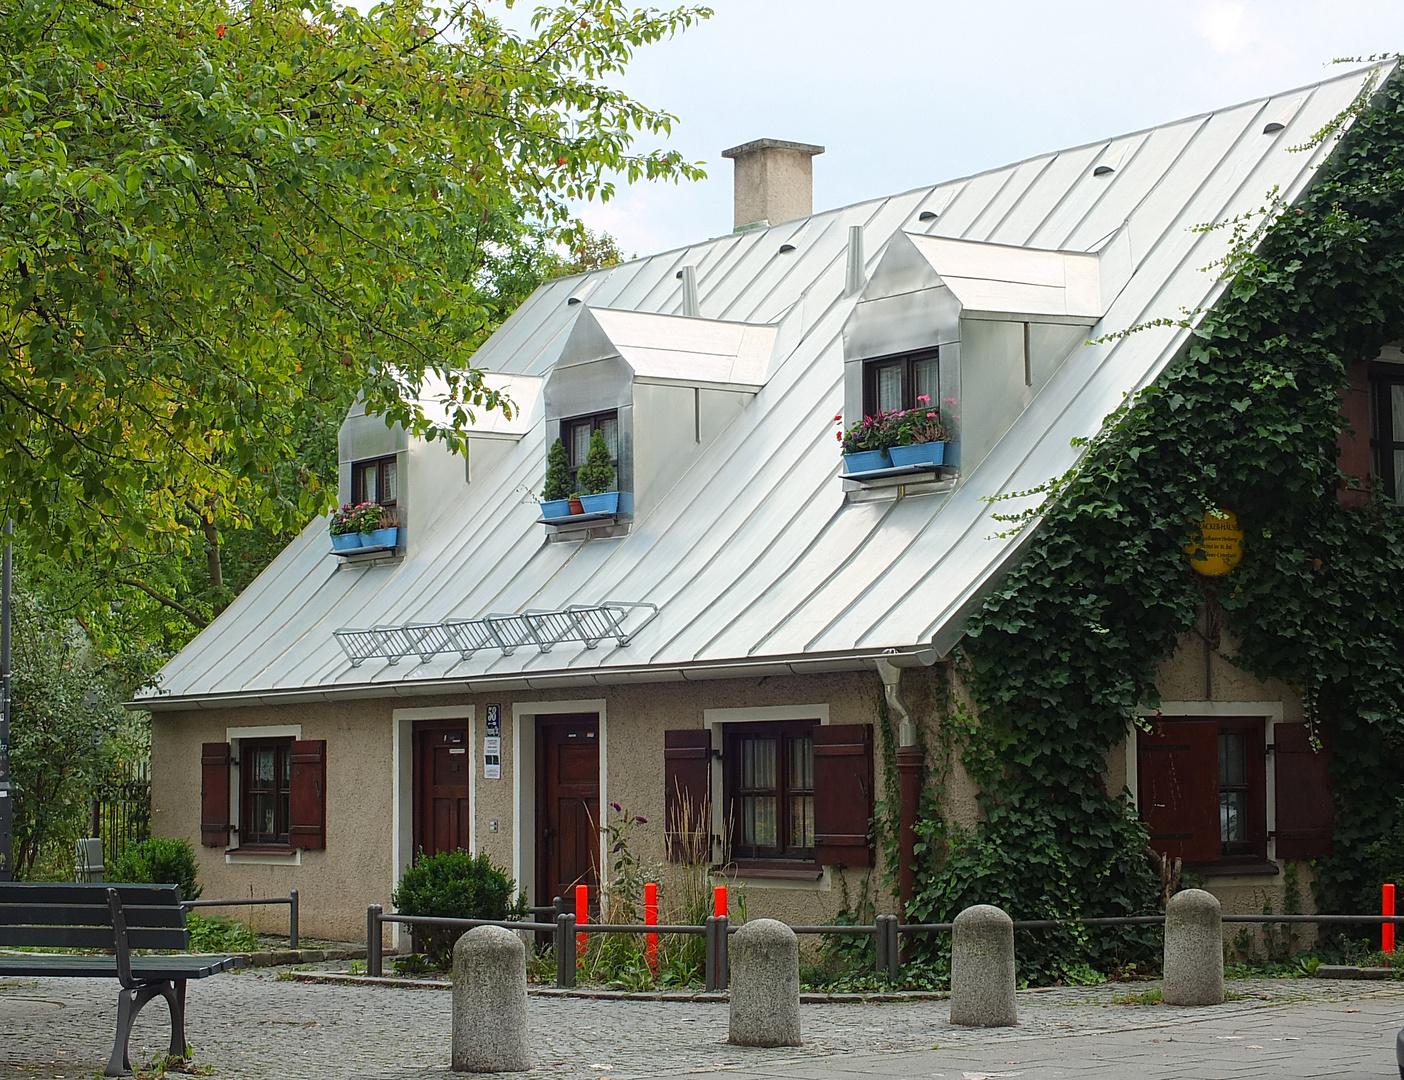 neues Dach - altes Haus